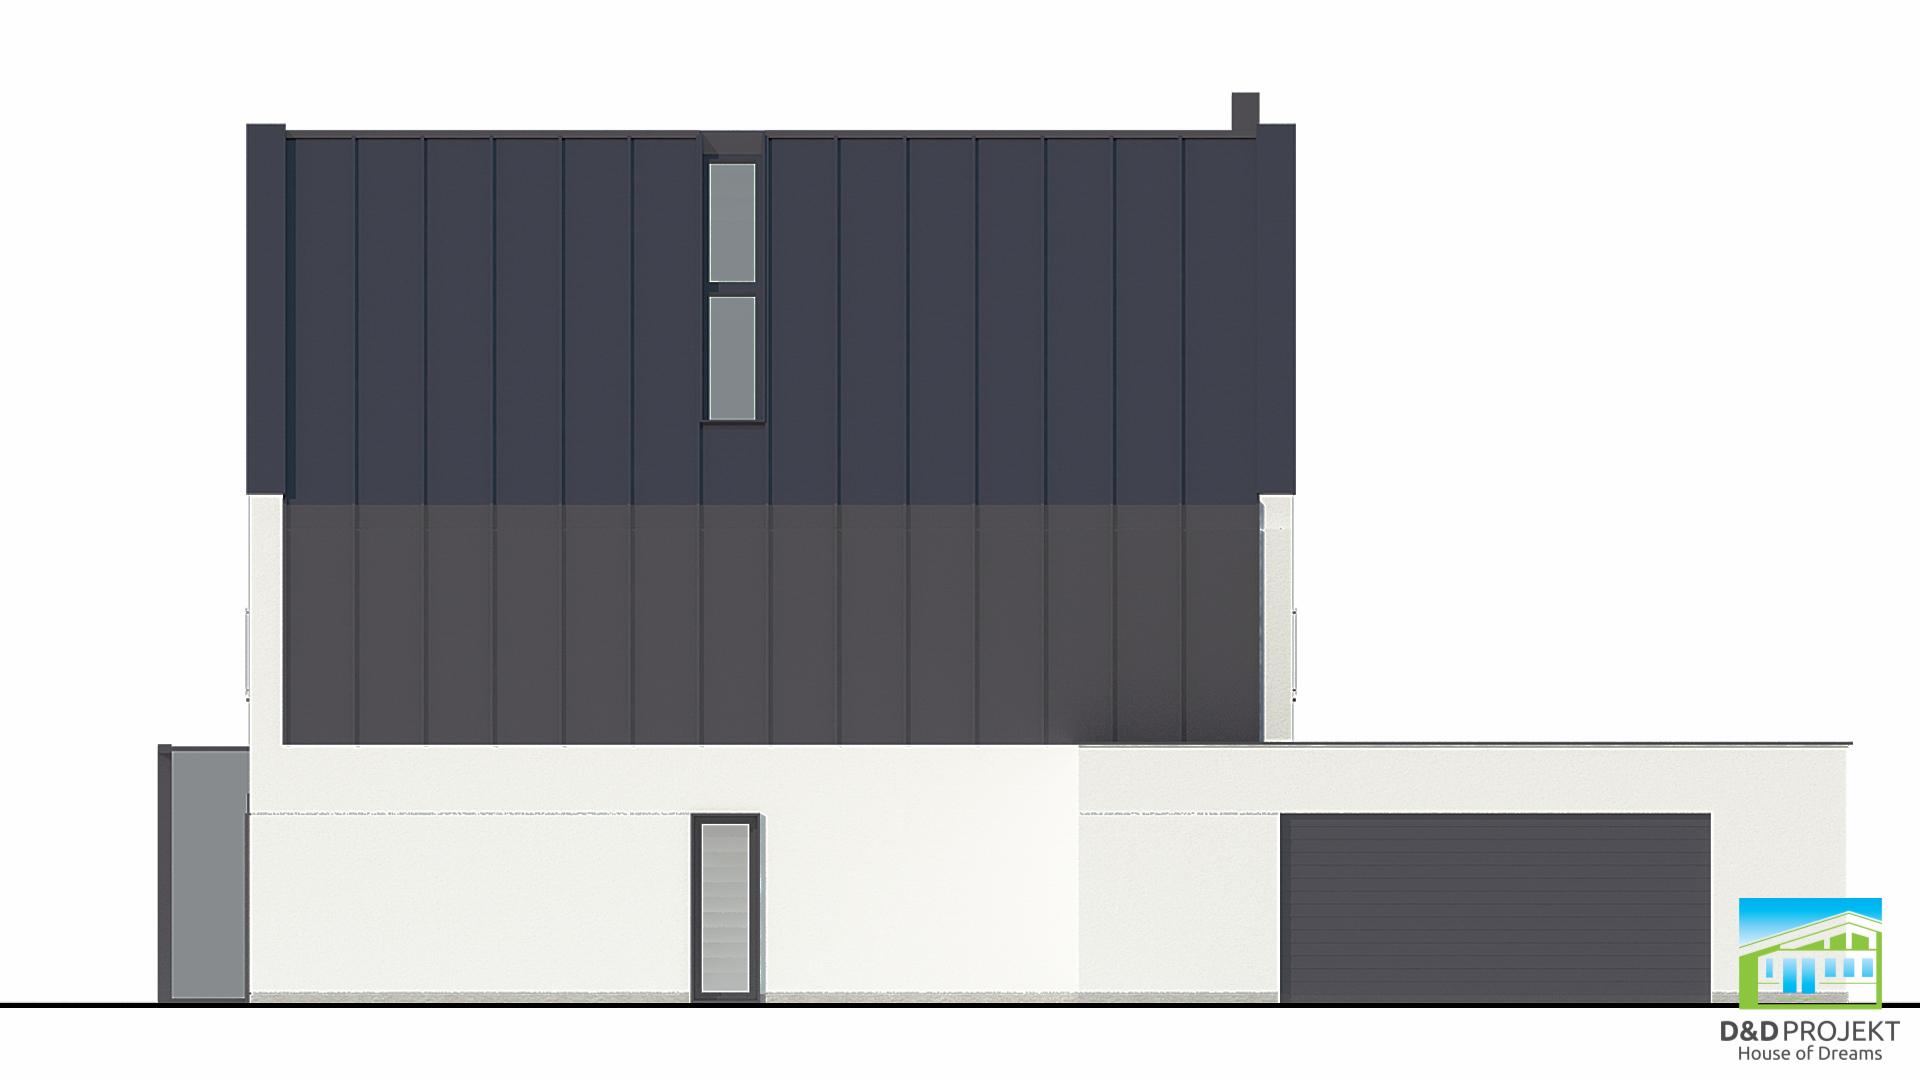 https://ddprojekt.pl/wp-content/uploads/2020/03/elewacja3-4.jpg